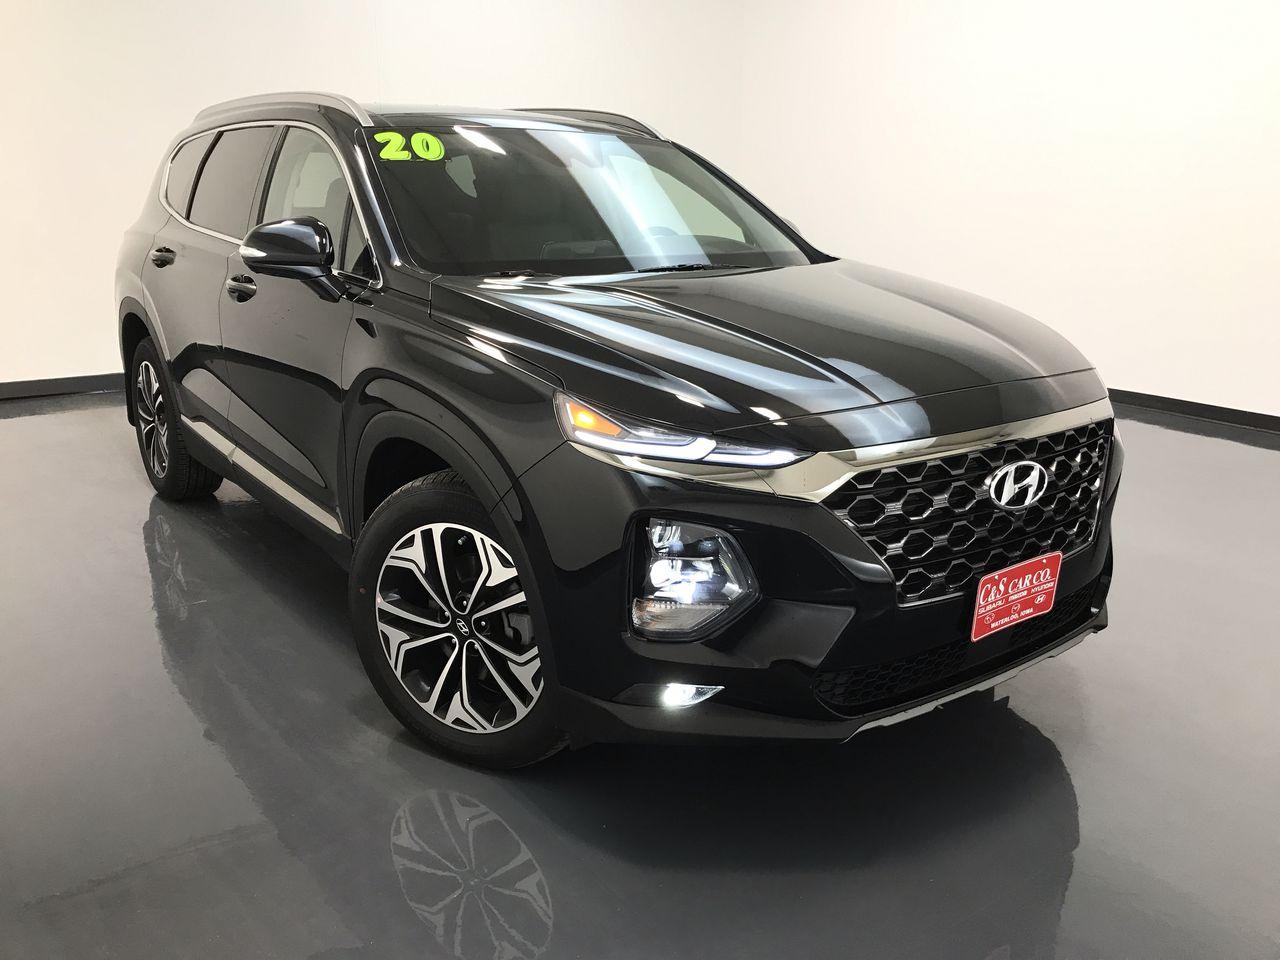 2020 Hyundai Santa Fe Limited 2.0T AWD  - HY8255  - C & S Car Company